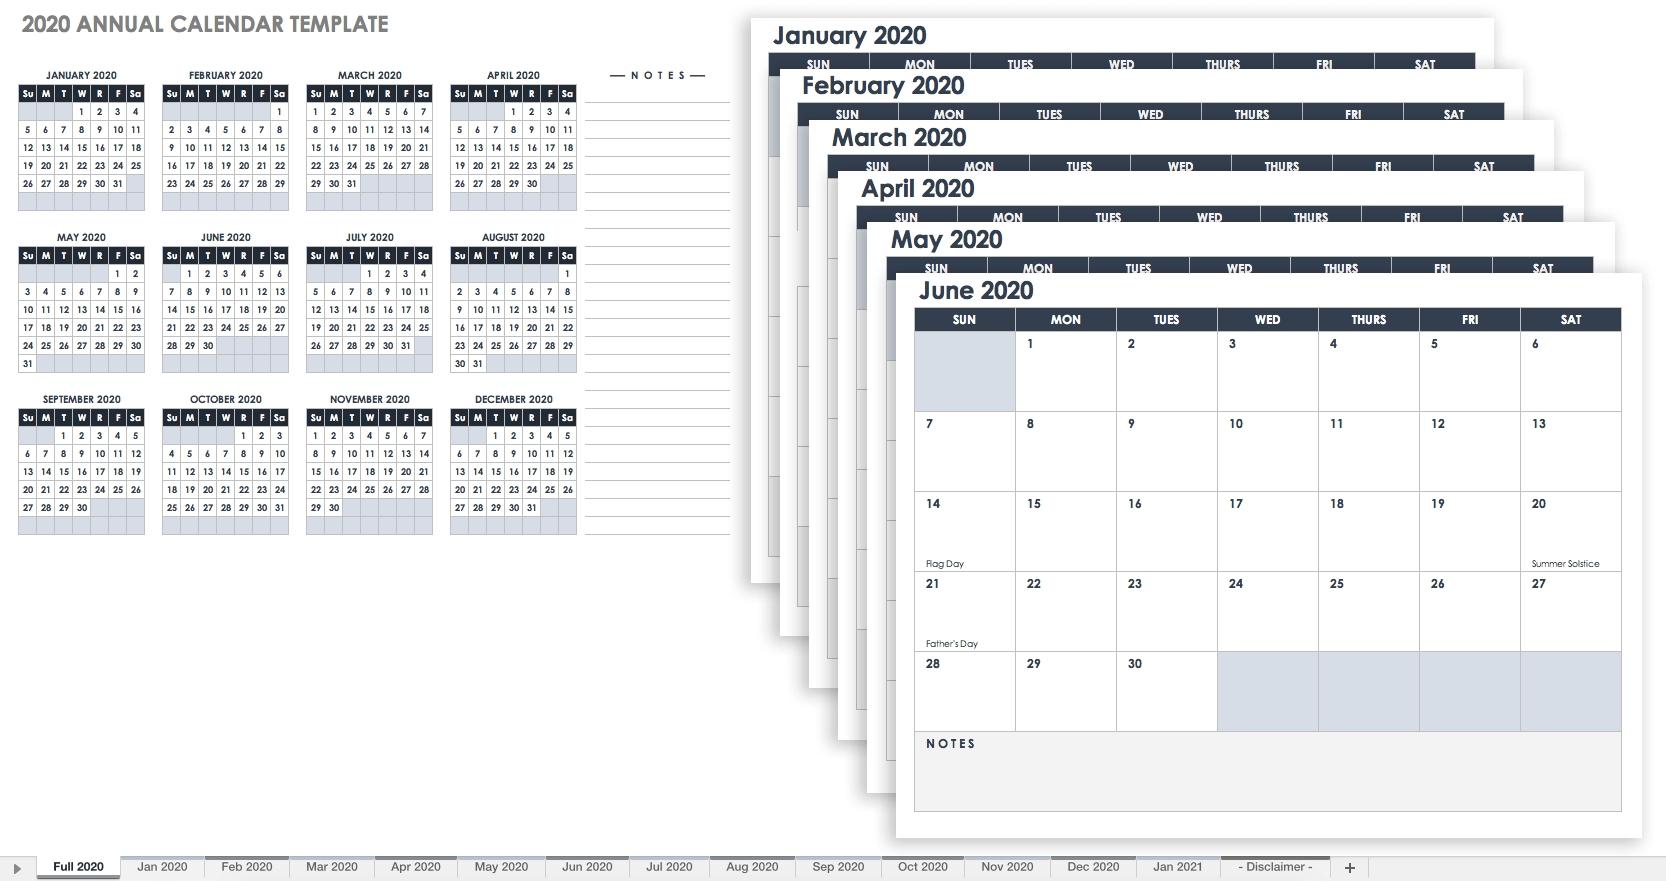 Free, Printable Excel Calendar Templates For 2019 & On | Smartsheet intended for Printable Calendar 2019 2020 Write On